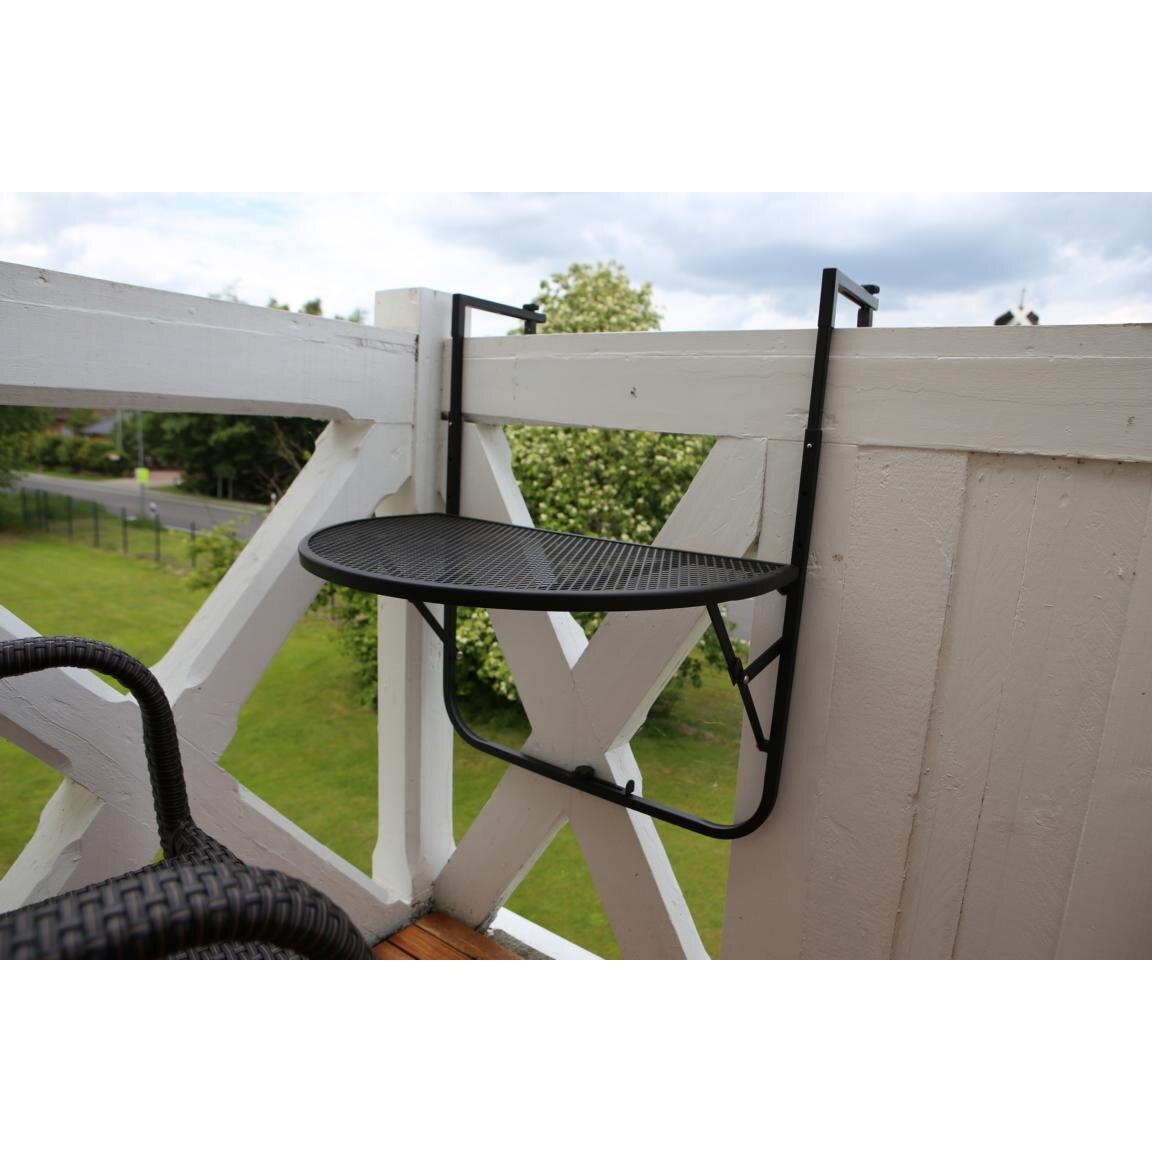 destiny klappbarer balkontisch padua bewertungen. Black Bedroom Furniture Sets. Home Design Ideas